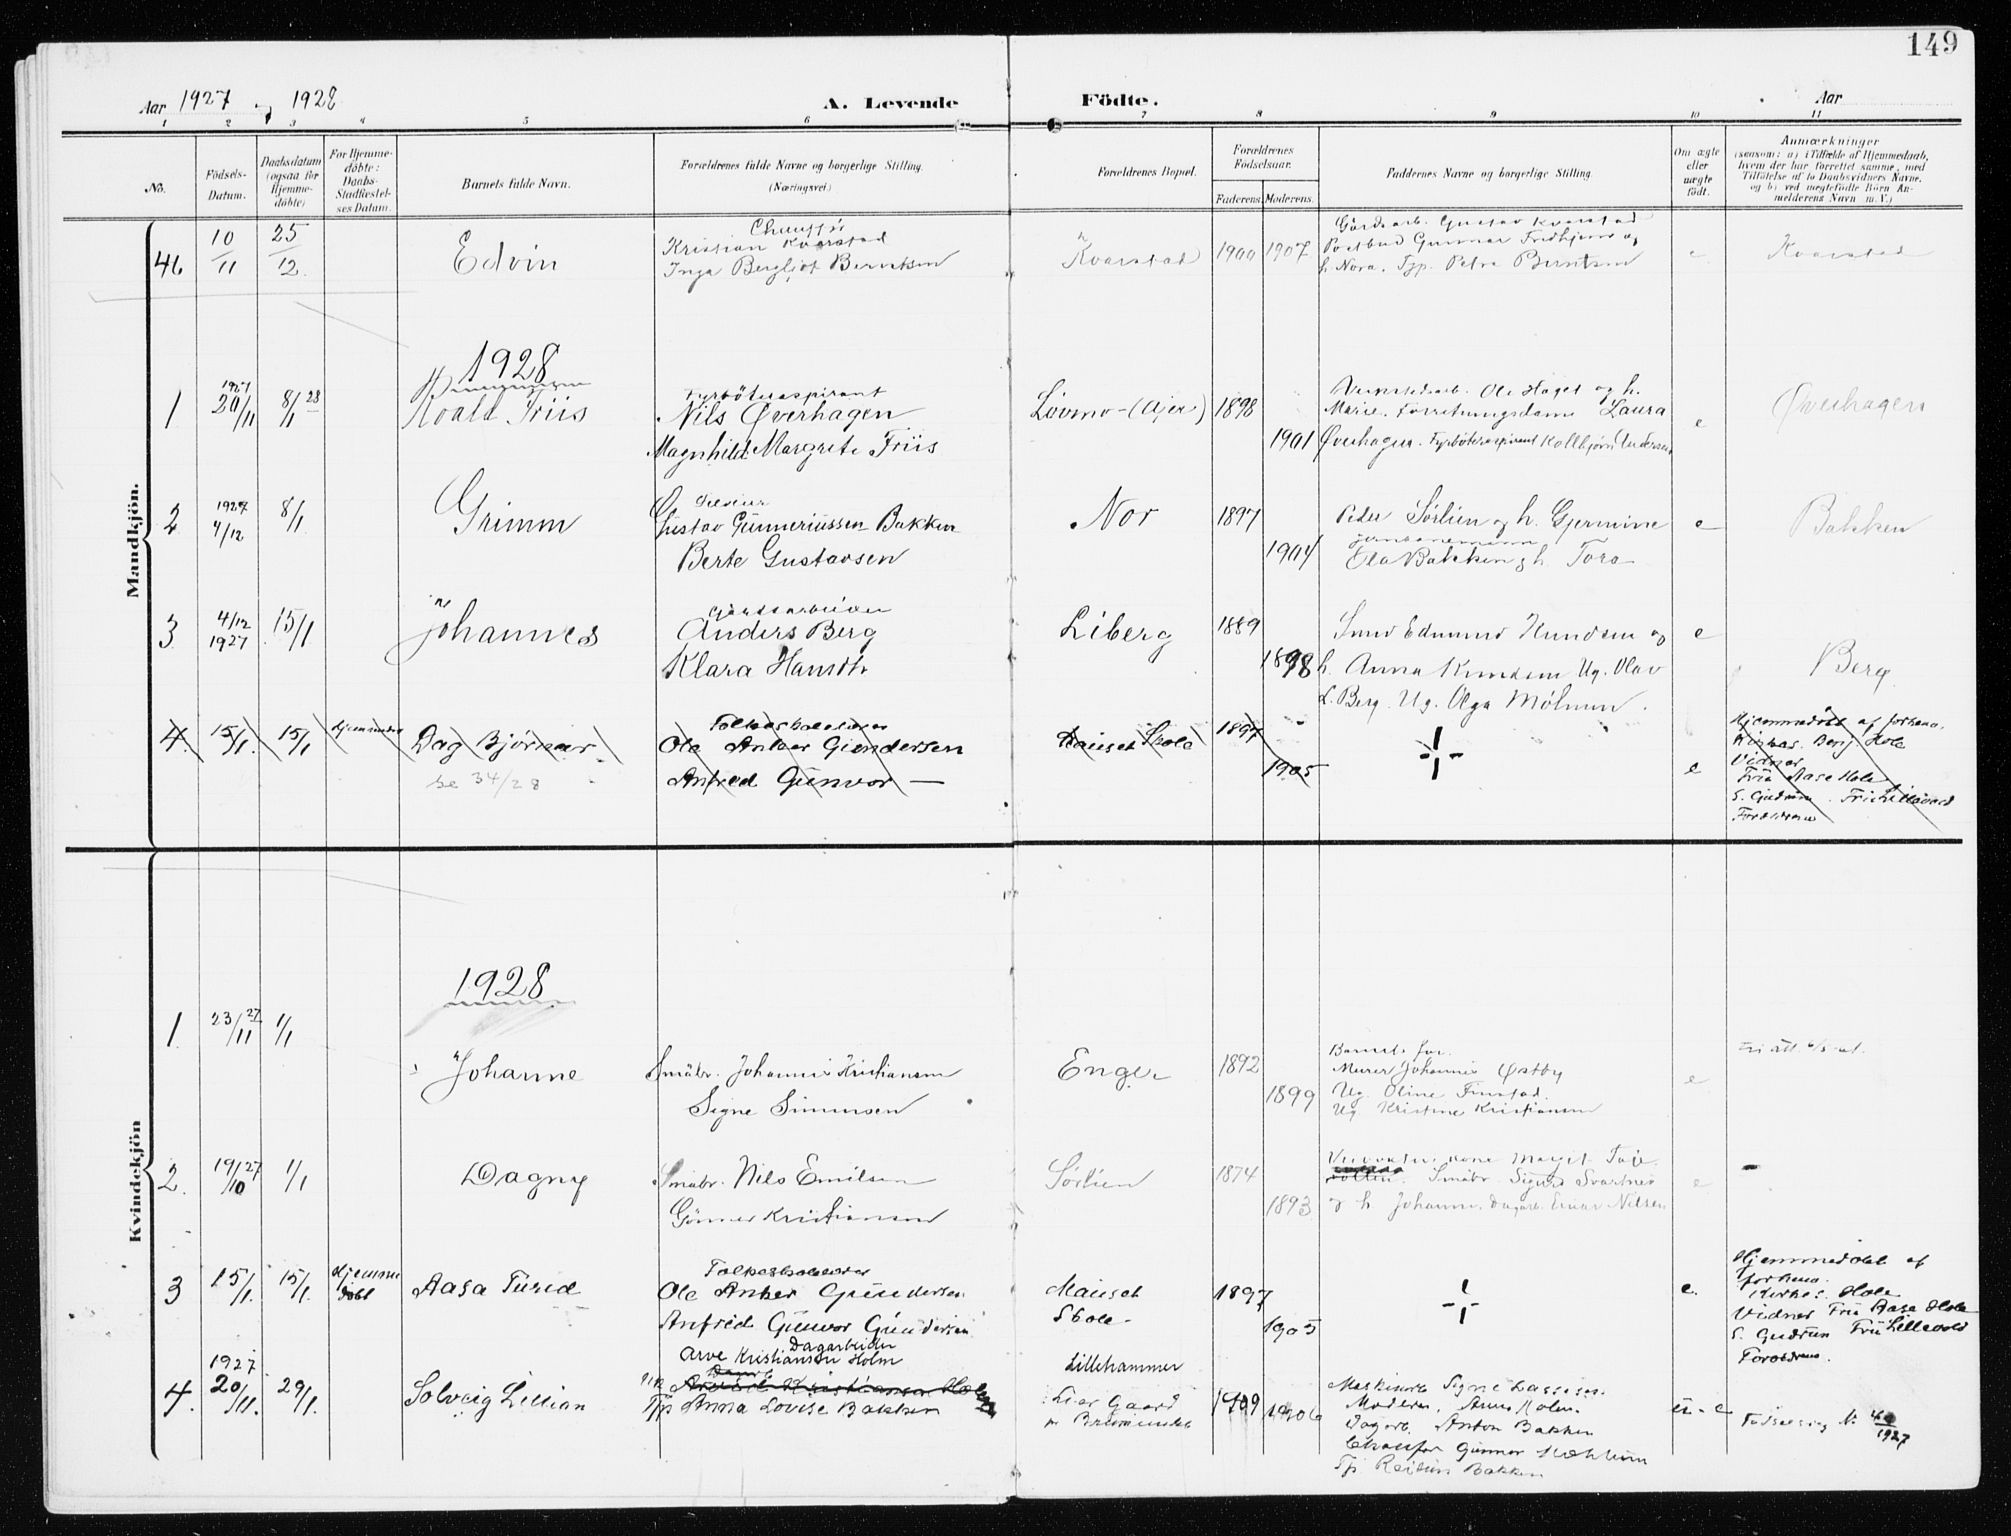 SAH, Furnes prestekontor, K/Ka/L0001: Ministerialbok nr. 1, 1907-1935, s. 149